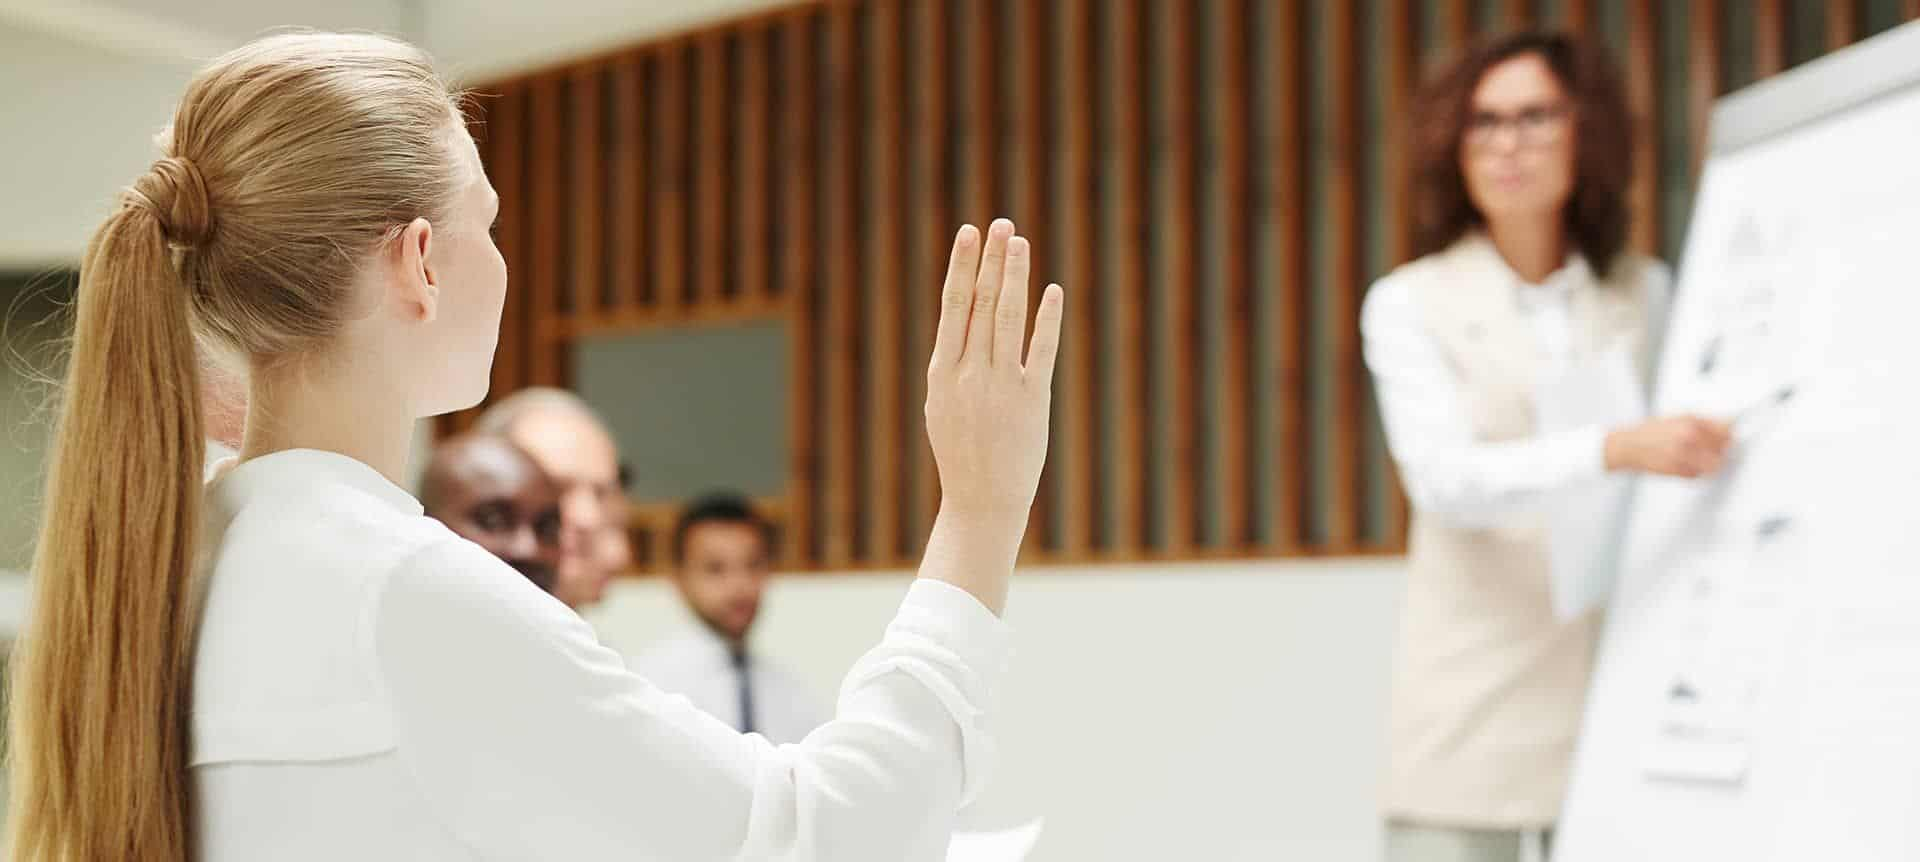 A female recruiter raising her hand